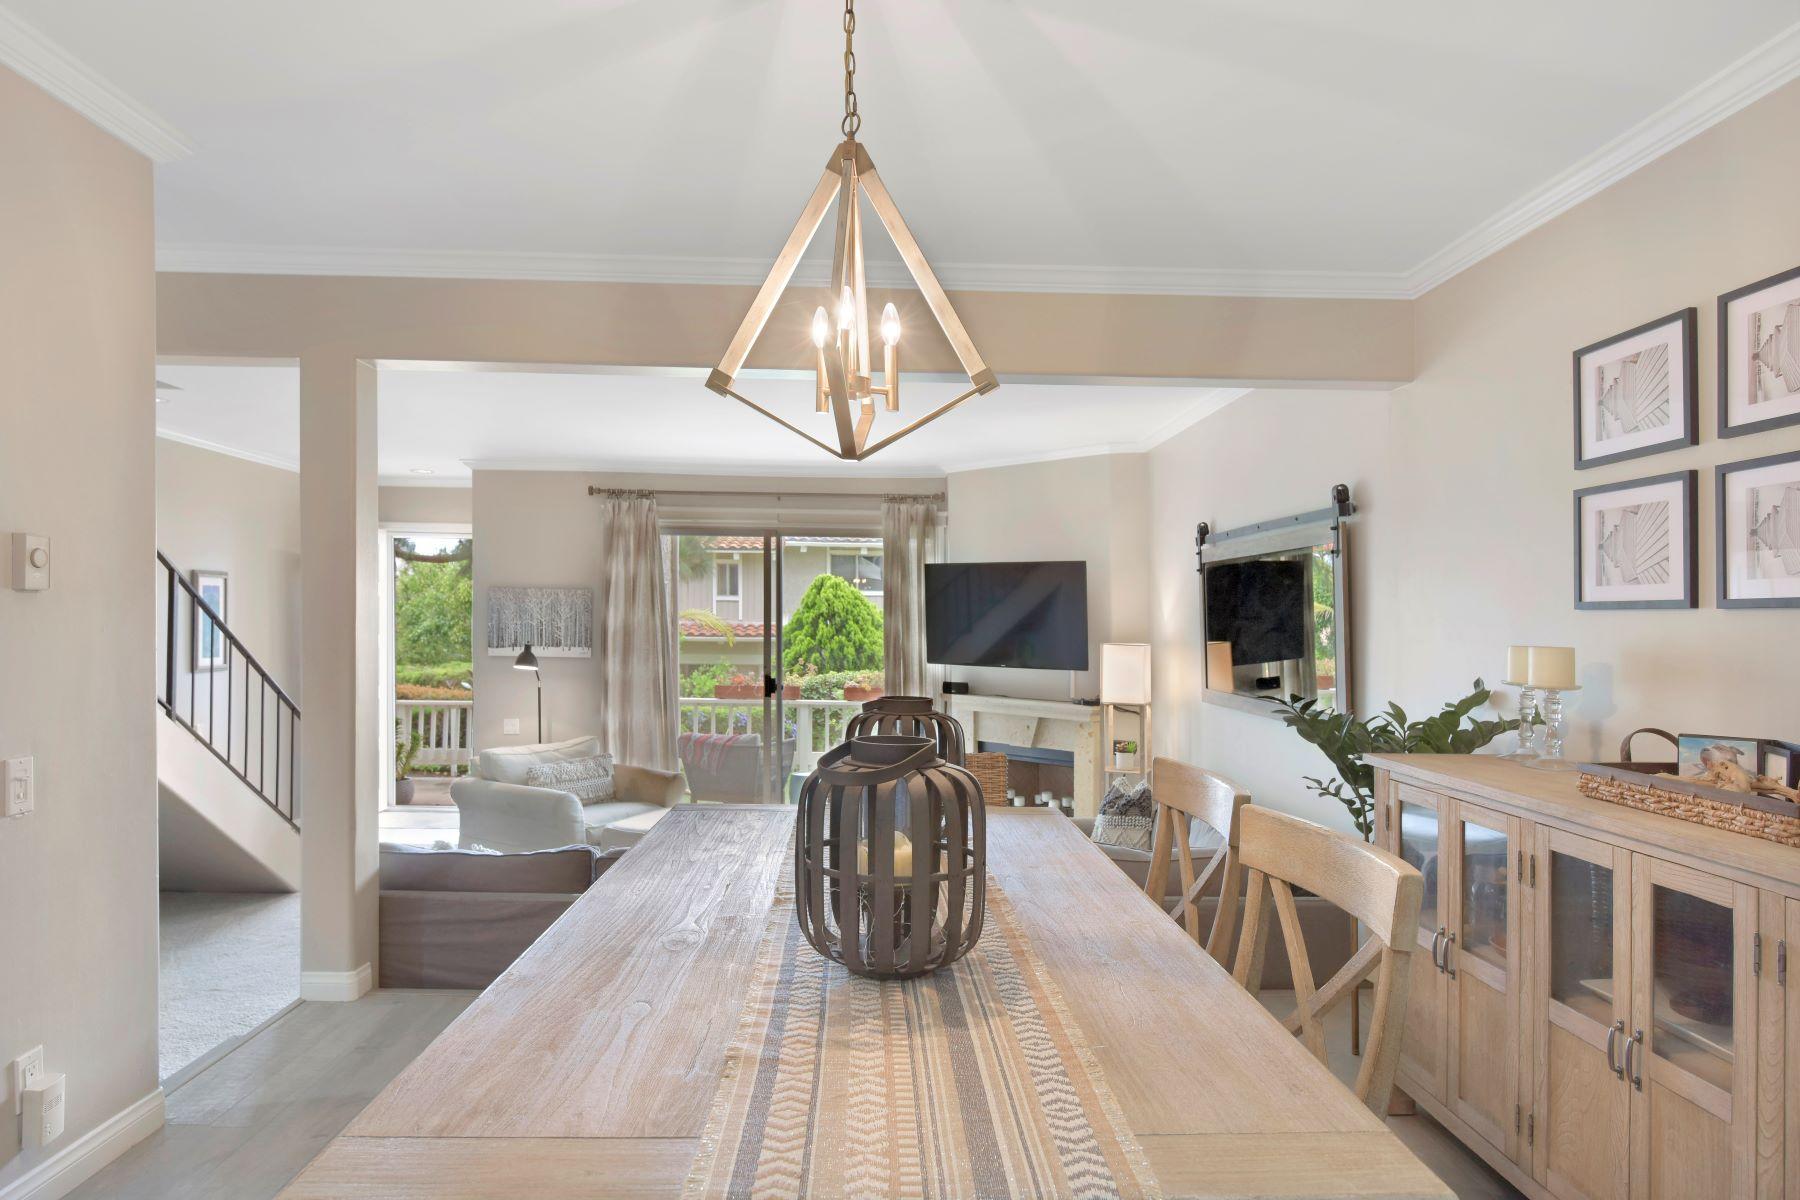 Property for Sale at Malibu Villas Third Row Condominium 28264 Rey De Copas Lane Malibu, California 90265 United States